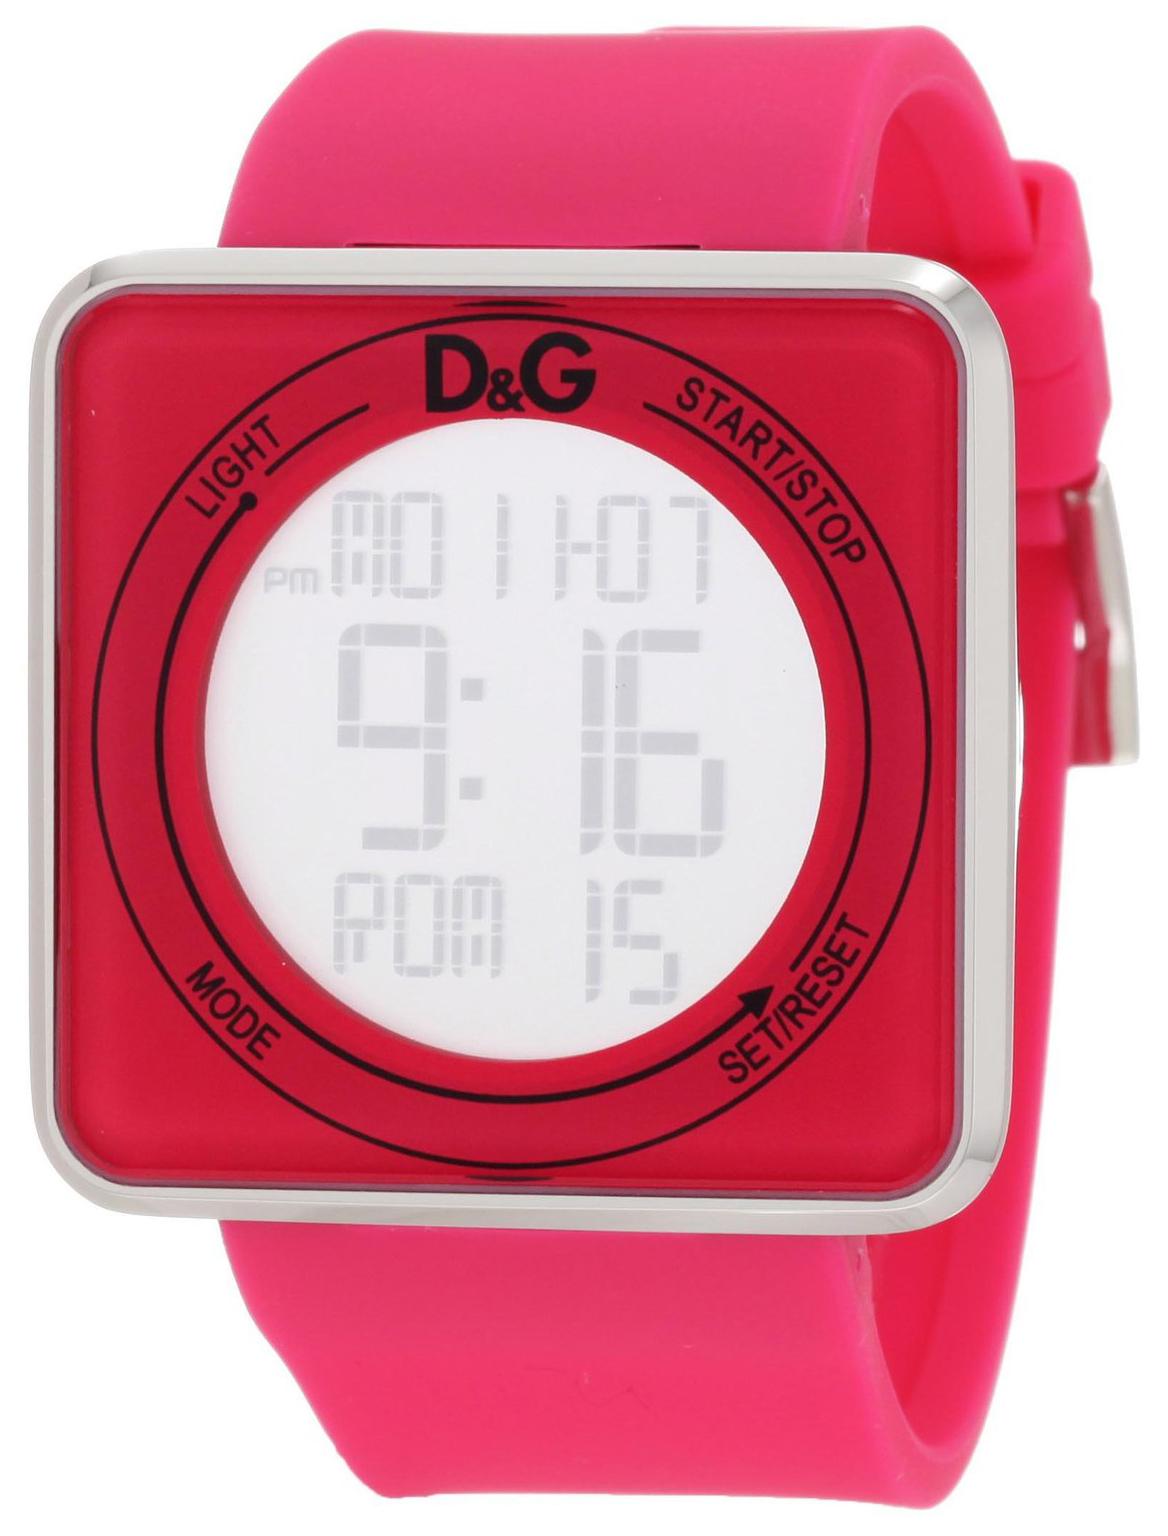 Dolce & Gabbana D&G High Contact Damklocka DW0737 - Dolce & Gabbana D&G